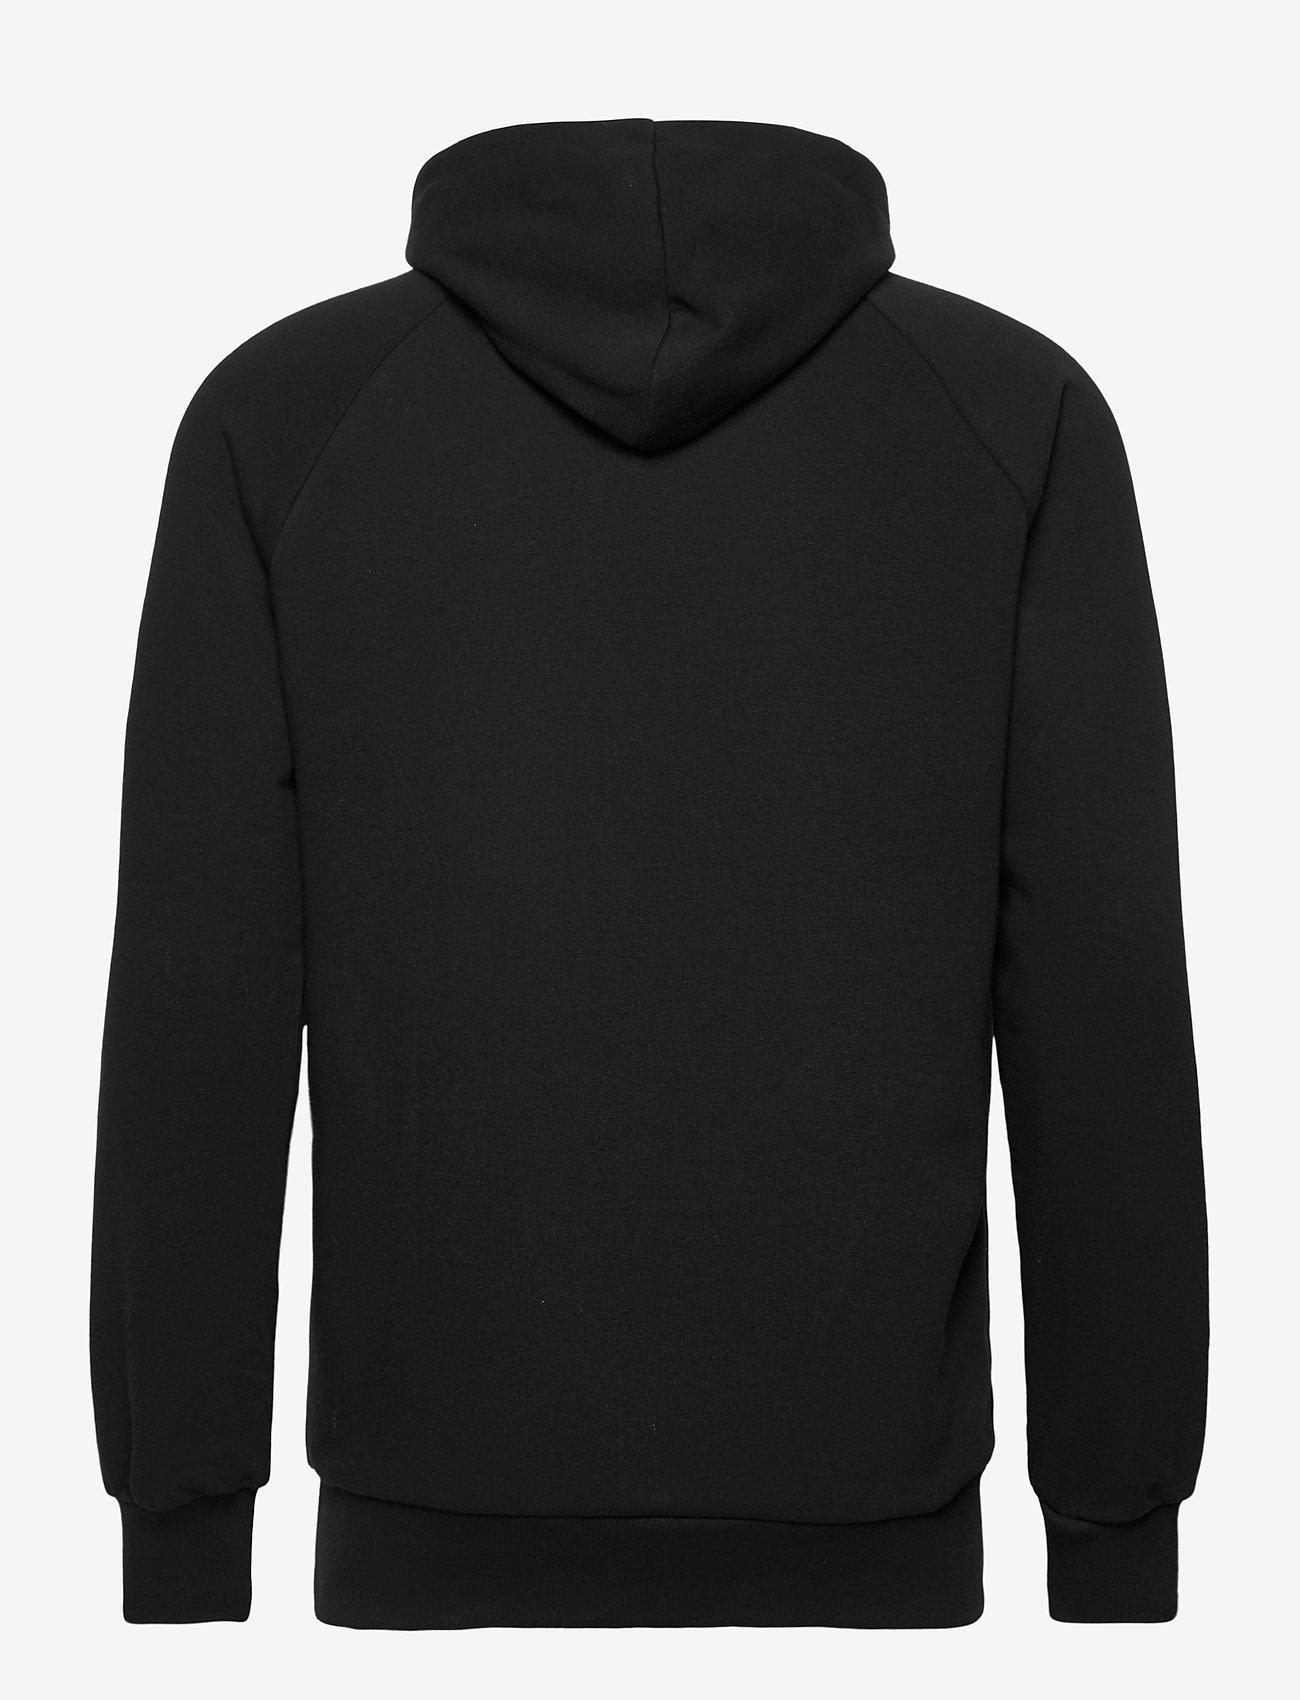 Hummel hmlISAM HOODIE - Sweatshirts BLACK - Menn Klær